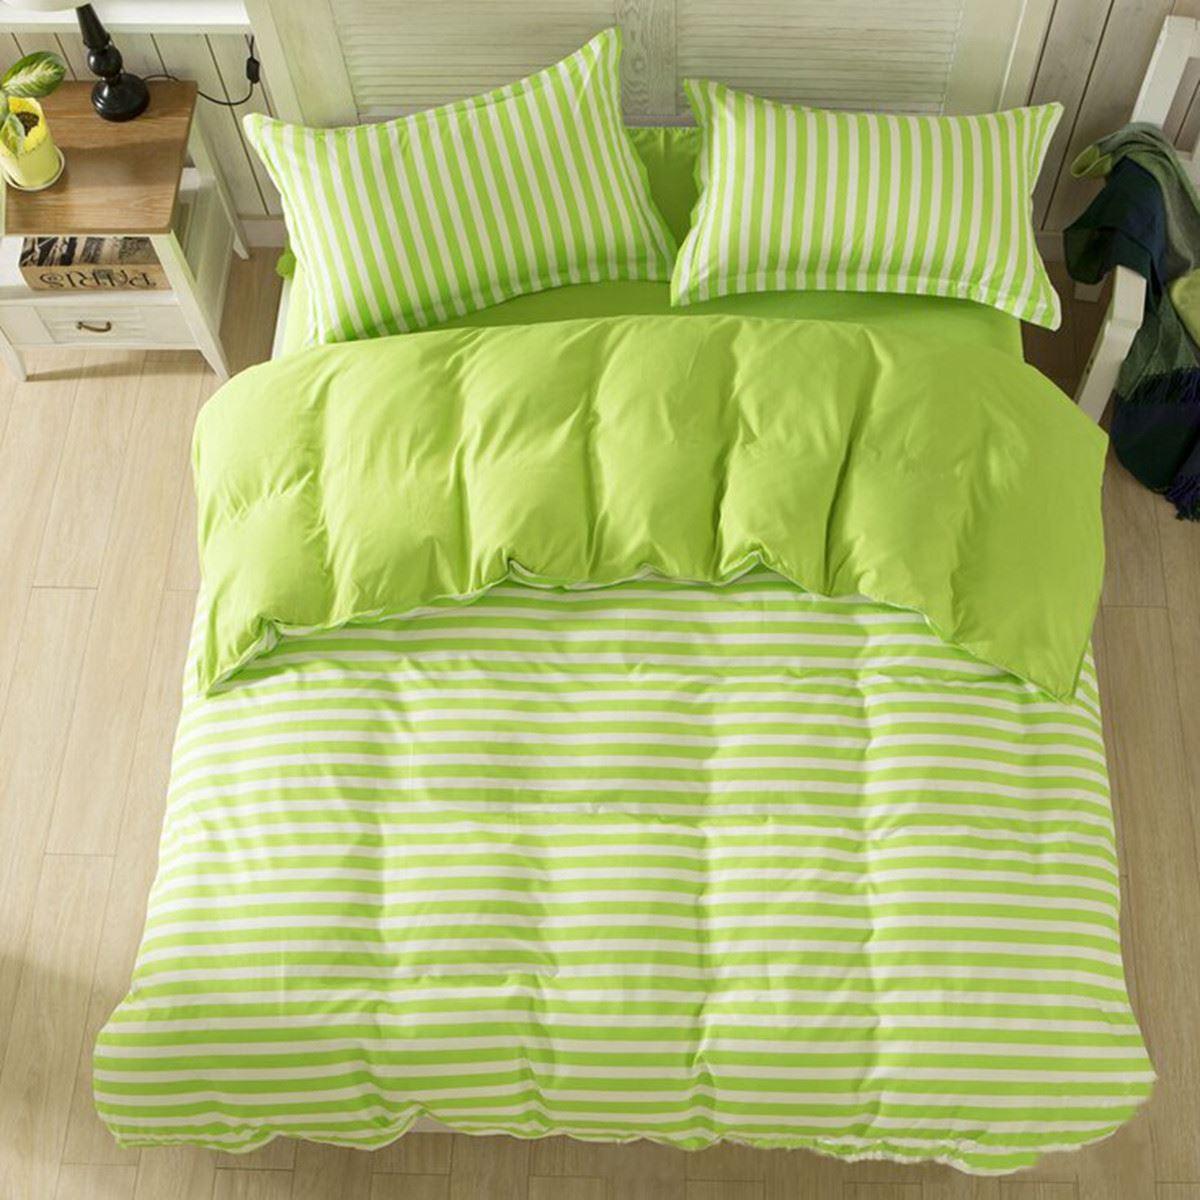 Sweet Green Stripe Quilt Print Bedding Sets Soft Cotton Duvet Cover Pillowcase Bedsheet Set Home Textile Single Double King Size